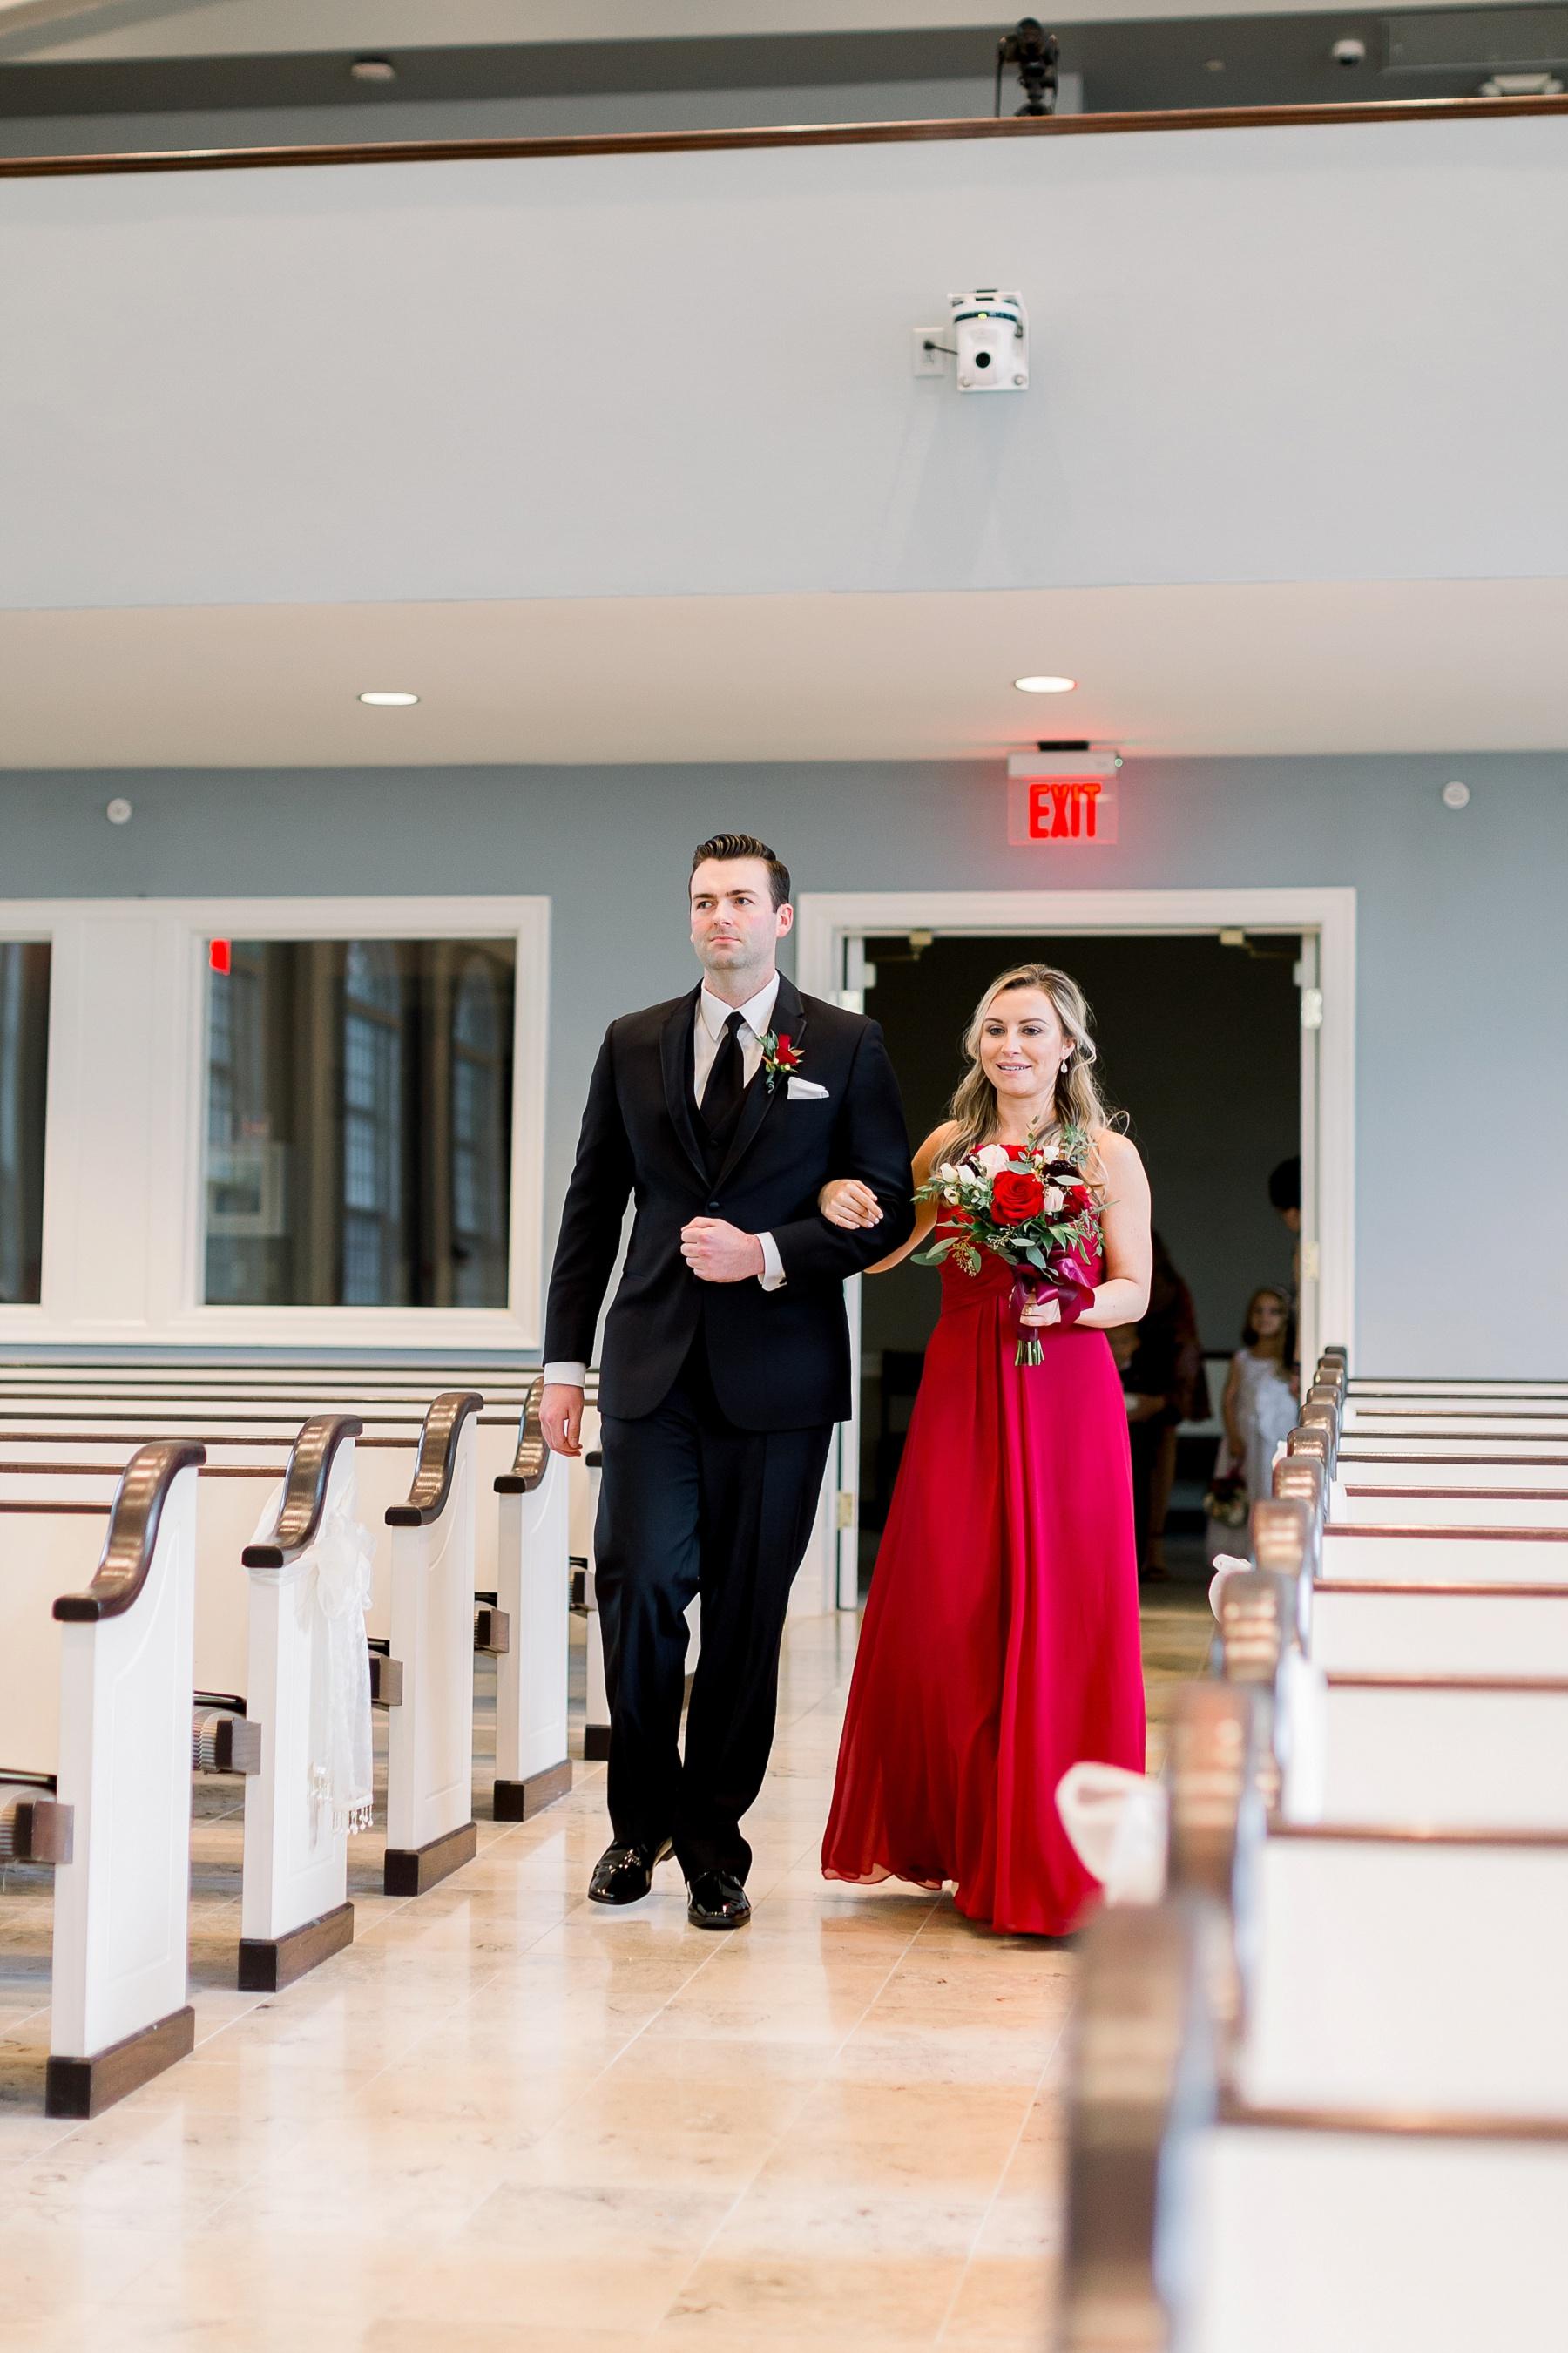 midwest-adventurous-wedding-photographer-elizabeth-ladean-photography-photo_4752.jpg